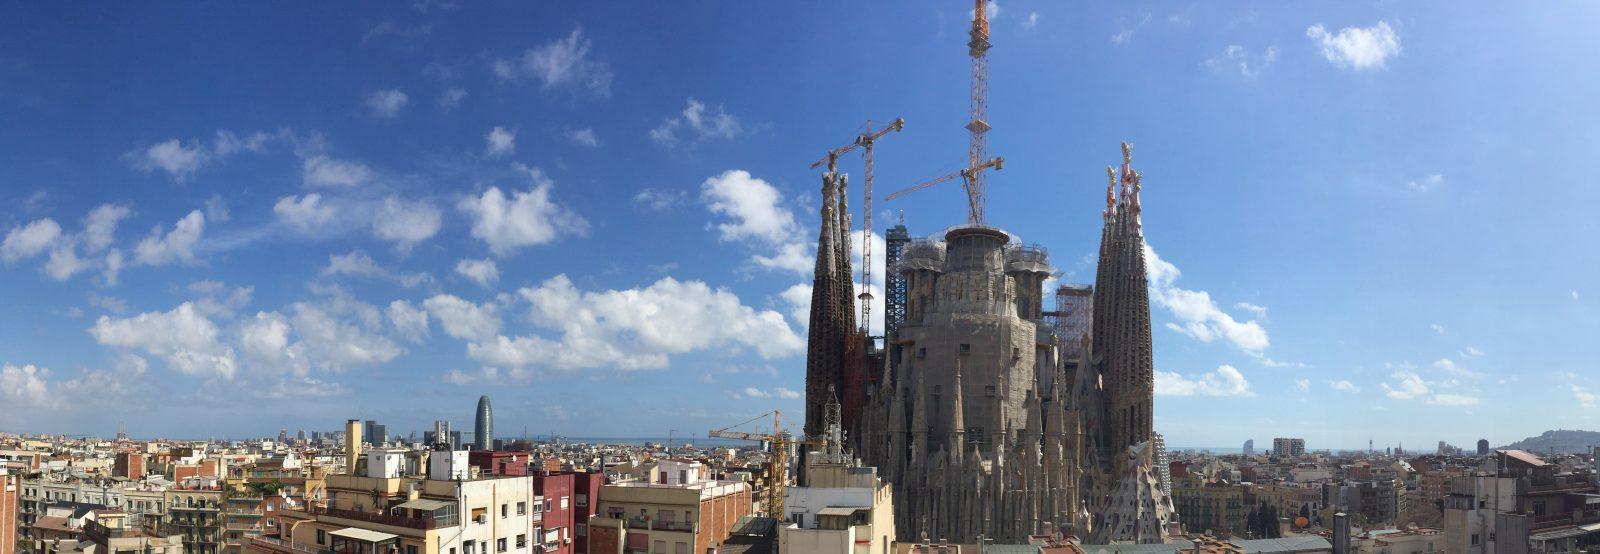 BarcelonaWink le blog : Barcelone en famille